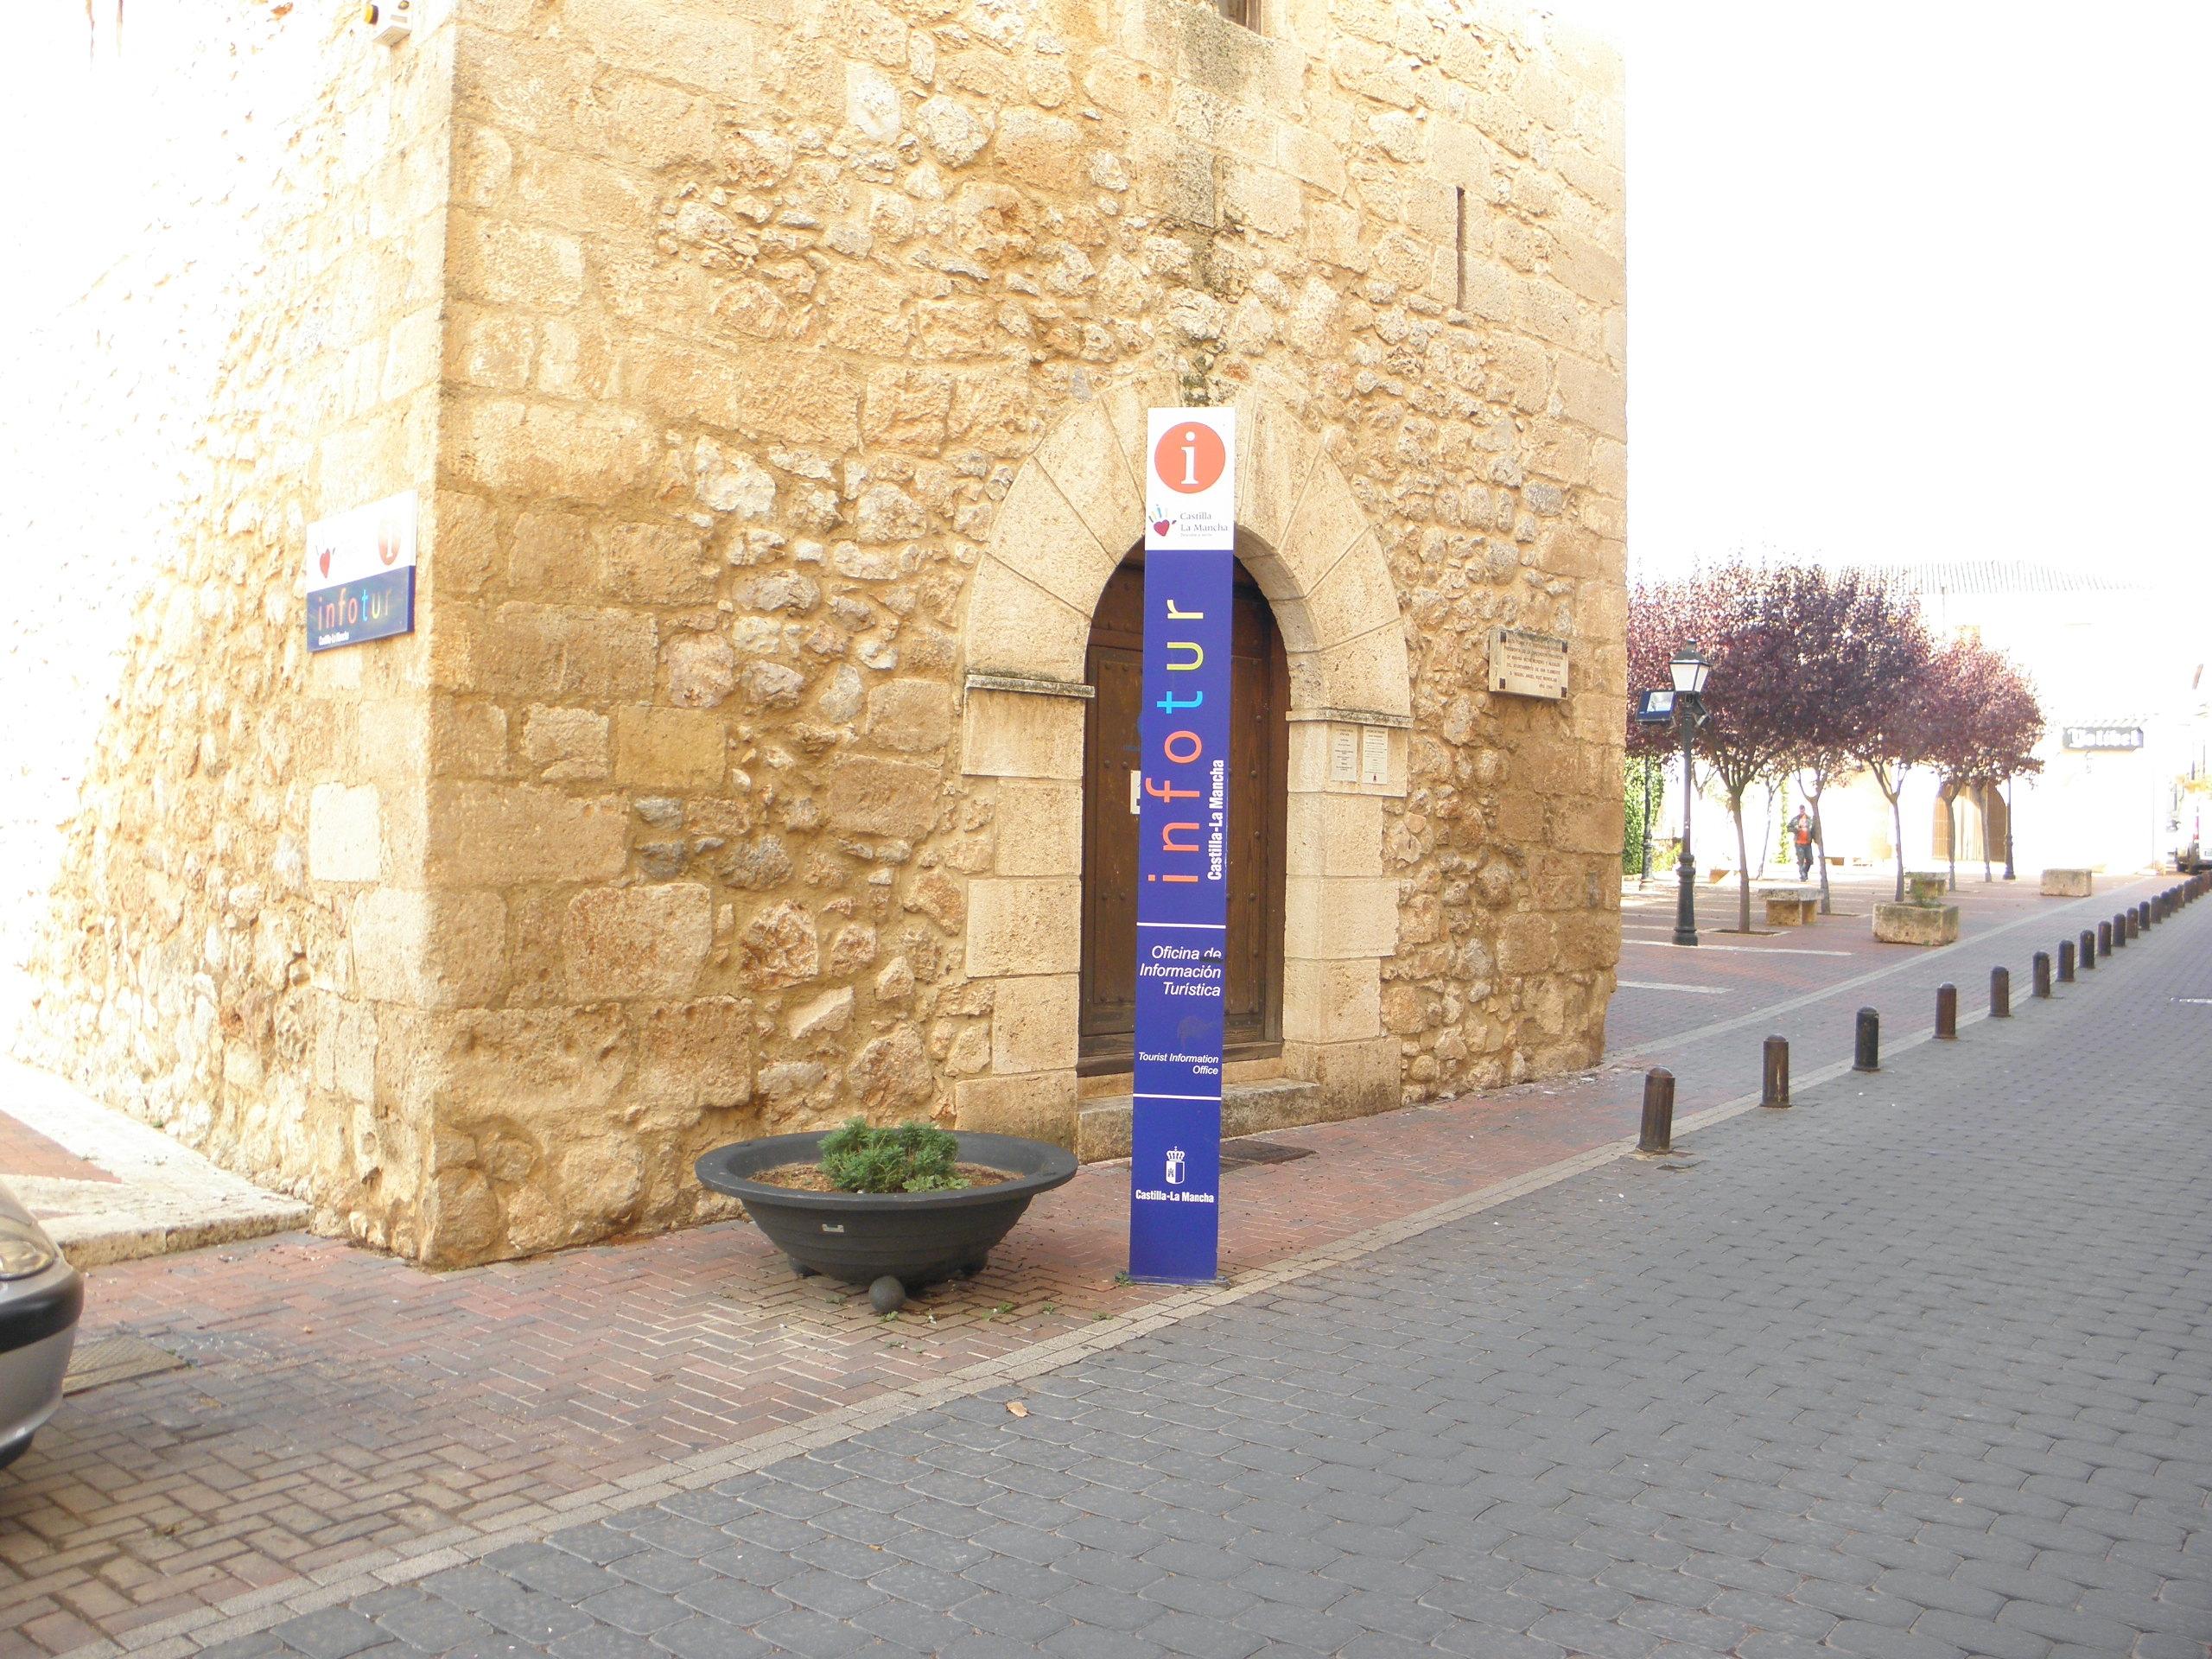 Turismo san clemente for Oficina de turismo cuenca